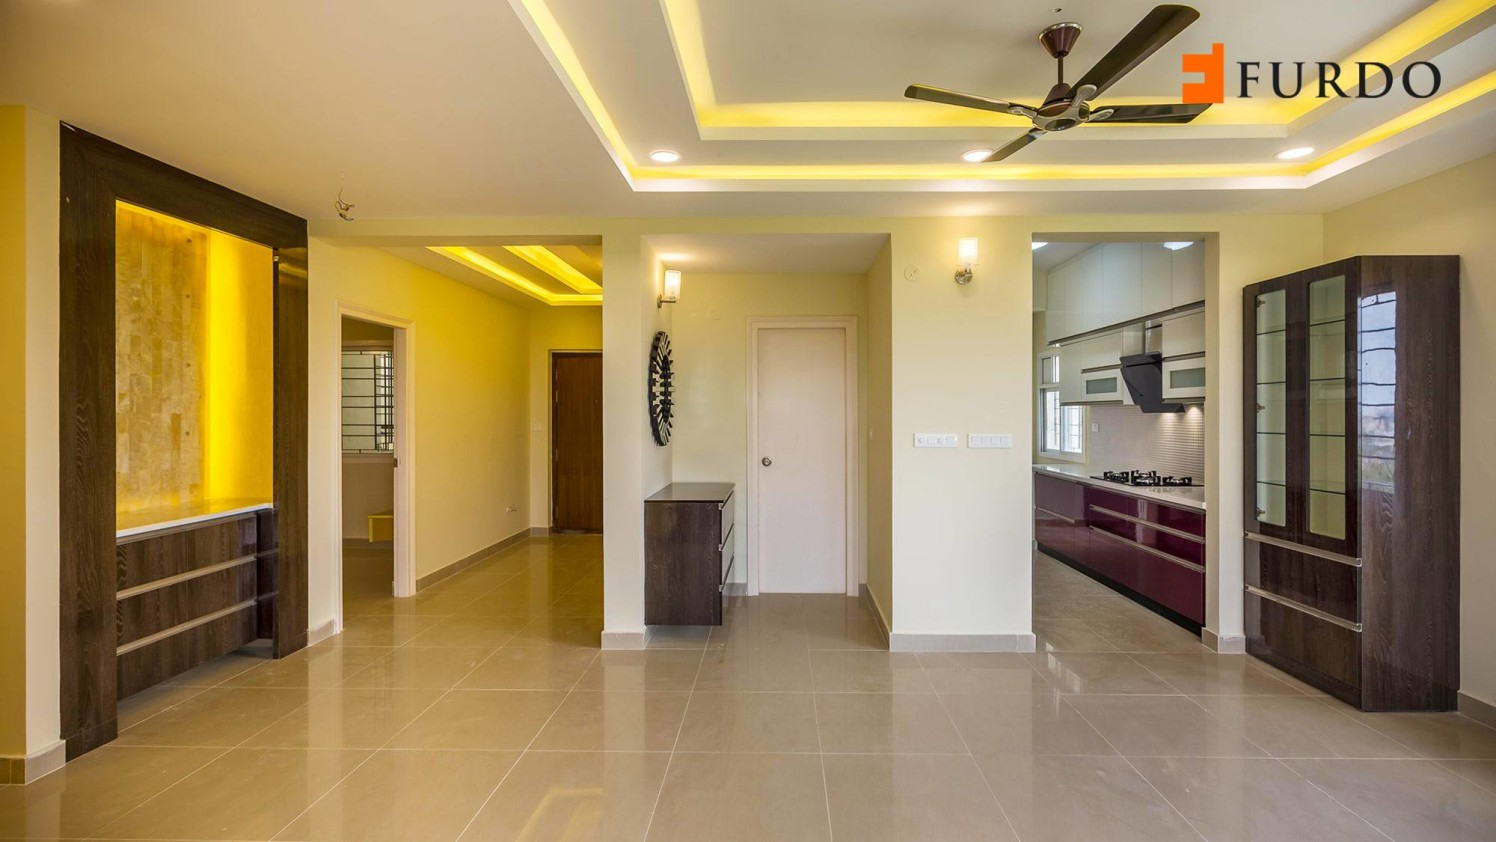 Hallway With White False Ceiling And Marble Flooring by Furdo.com Living-room Modern | Interior Design Photos & Ideas